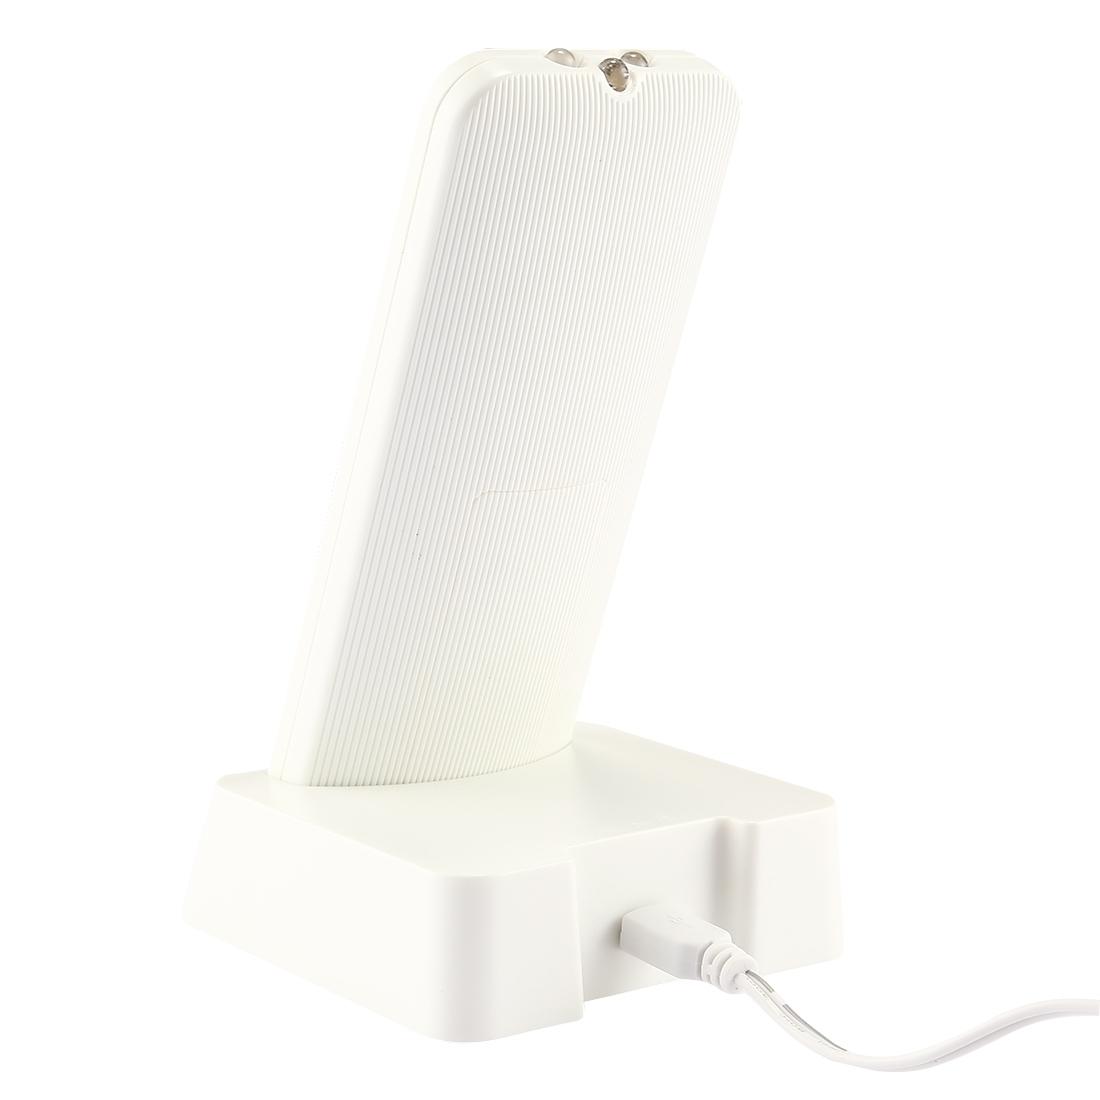 Generic CHUNGHOP K-390EW WiFi Smart Universal Air